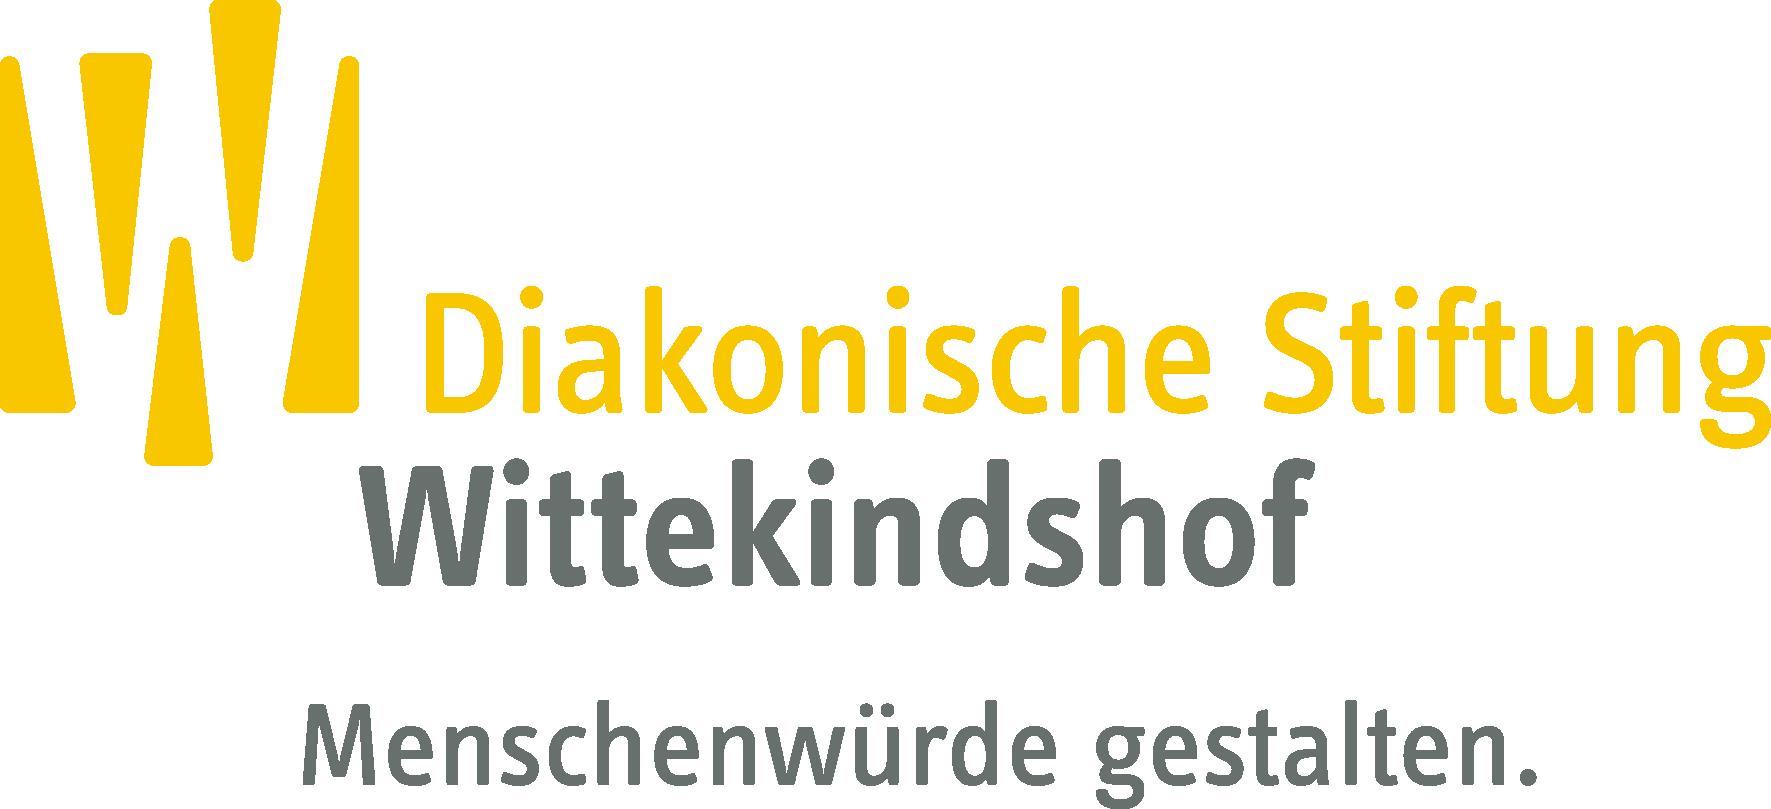 Logo: Diakonische Stiftung Wittekindshof